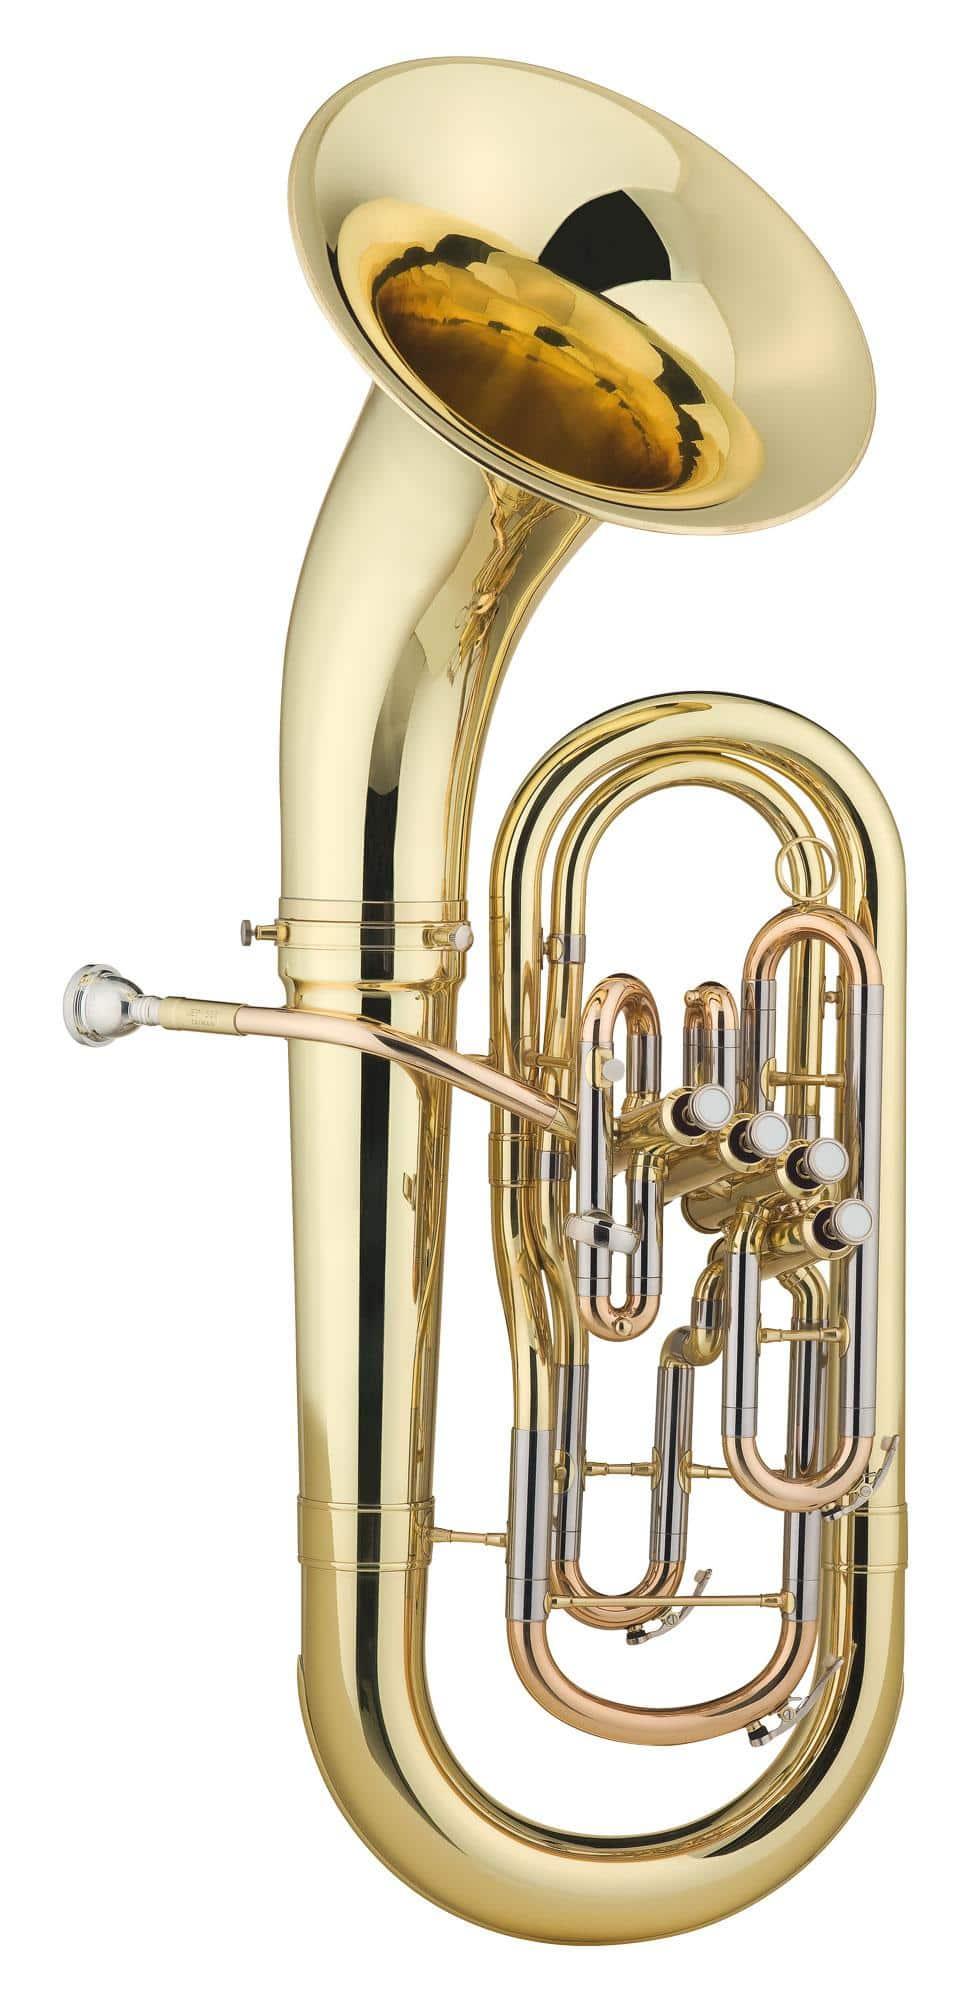 Baritone - Jupiter JEP1010 Bellfront Oberkrainer Bariton - Onlineshop Musikhaus Kirstein